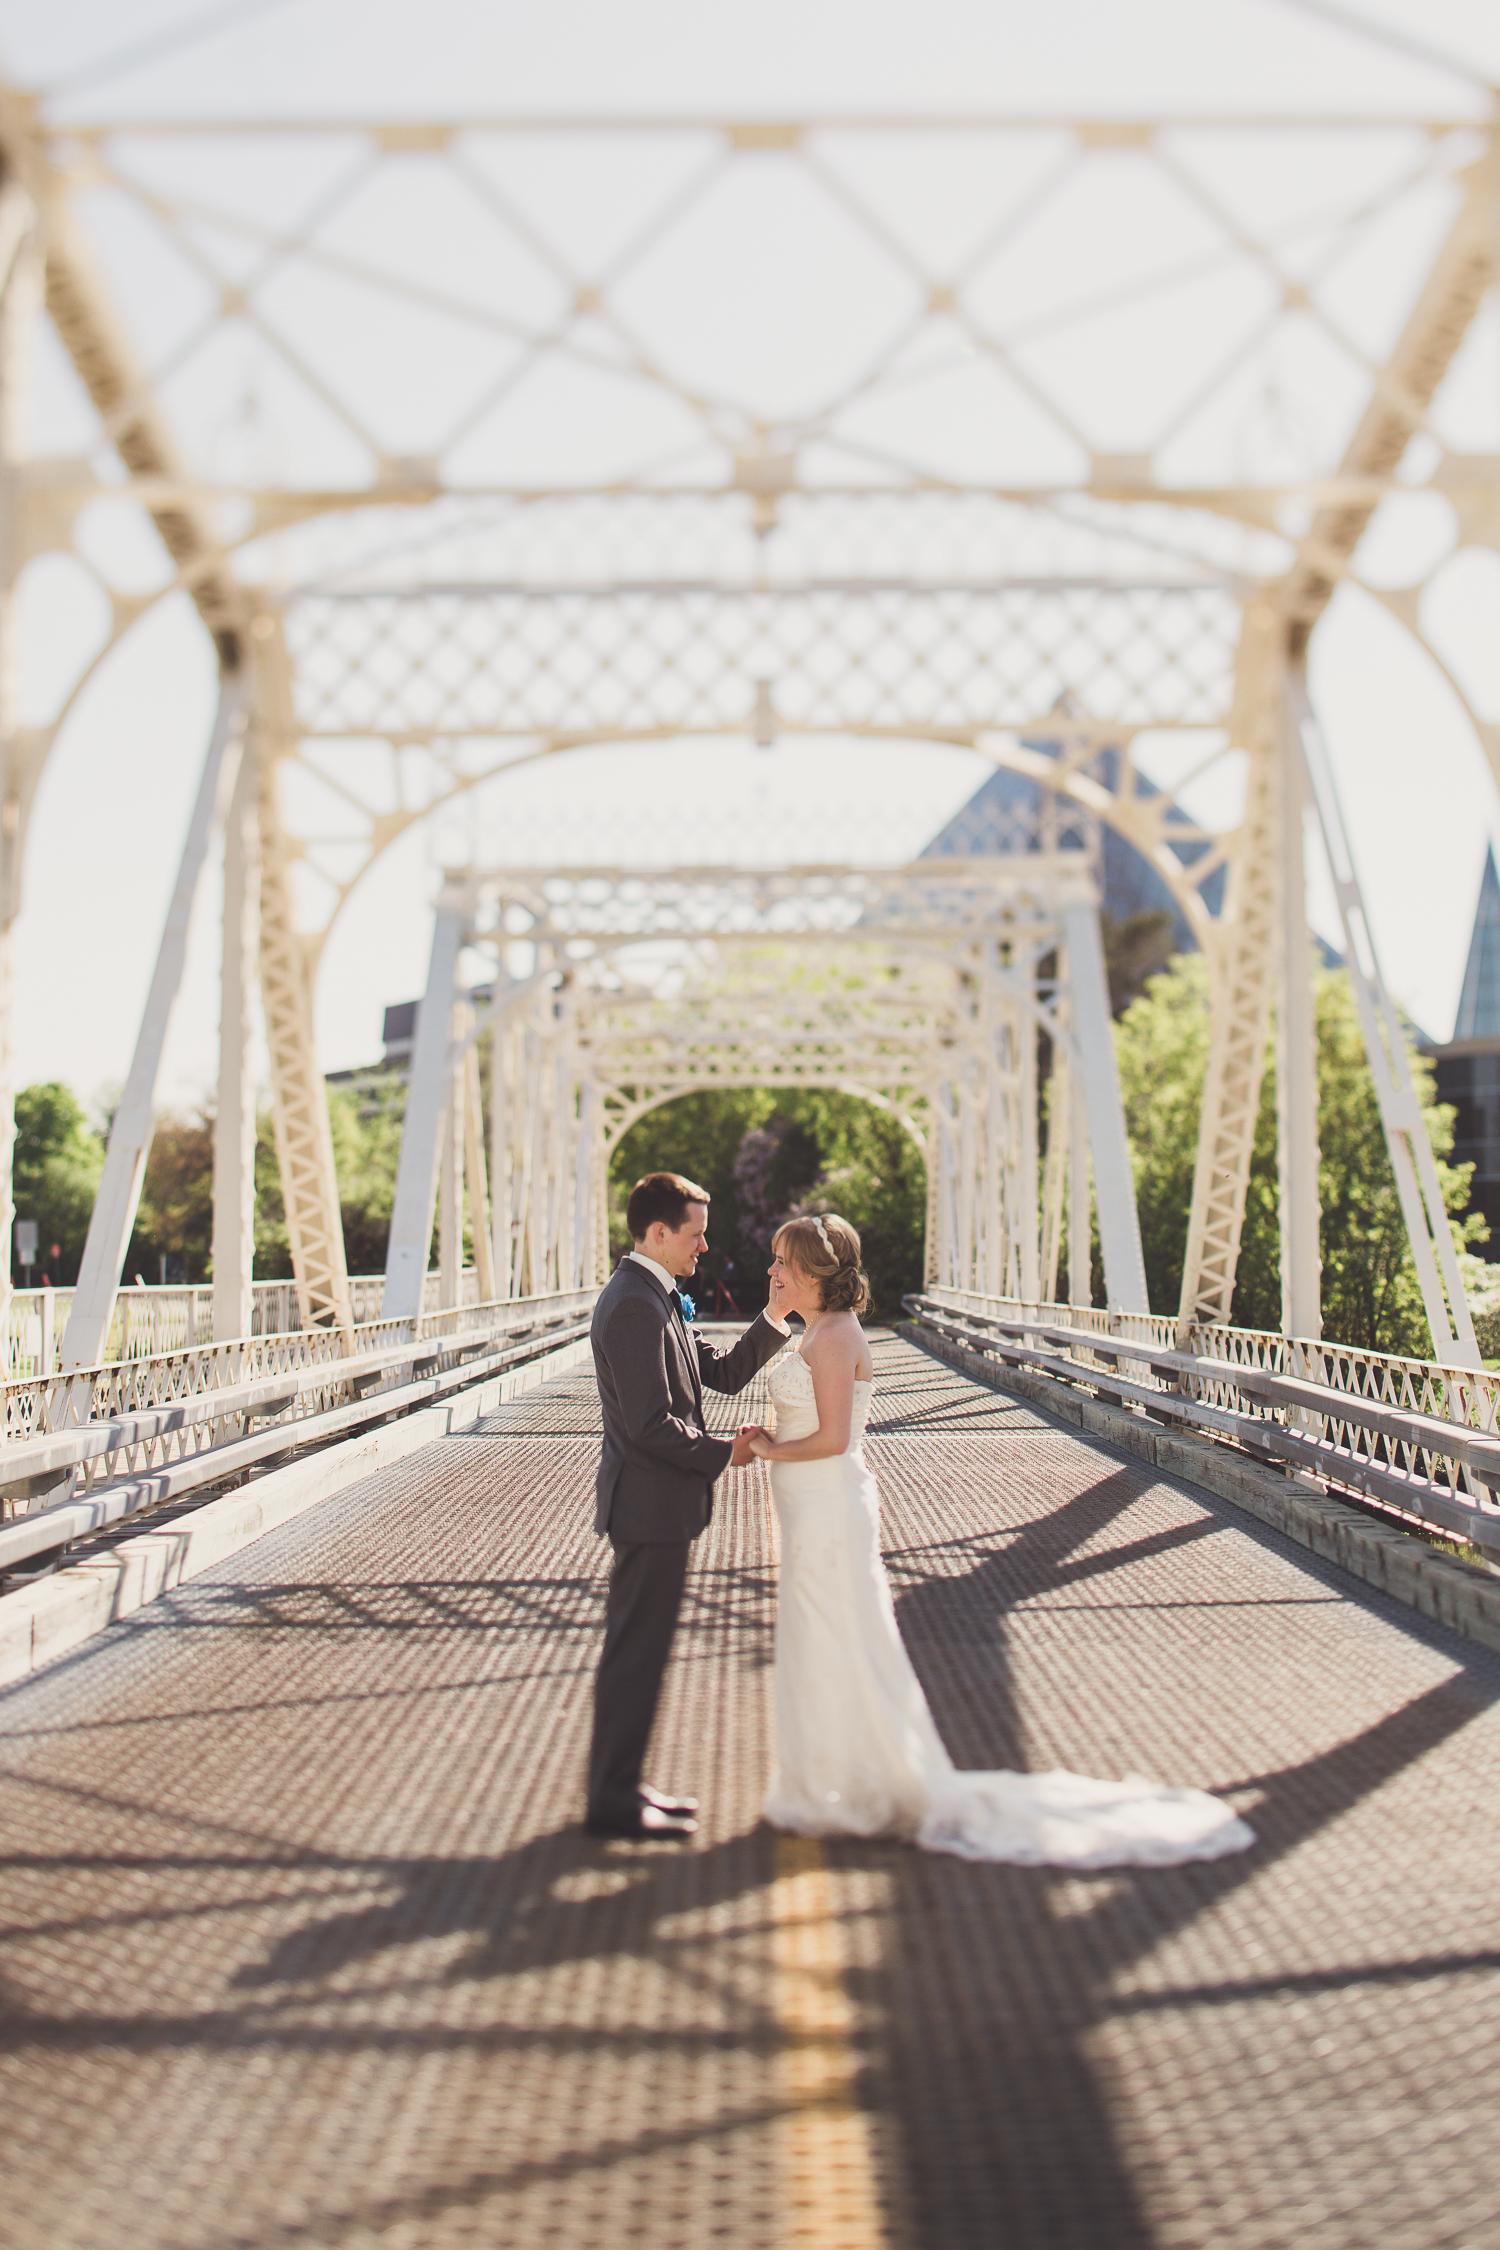 Minto-Bridges-Ottawa-wedding